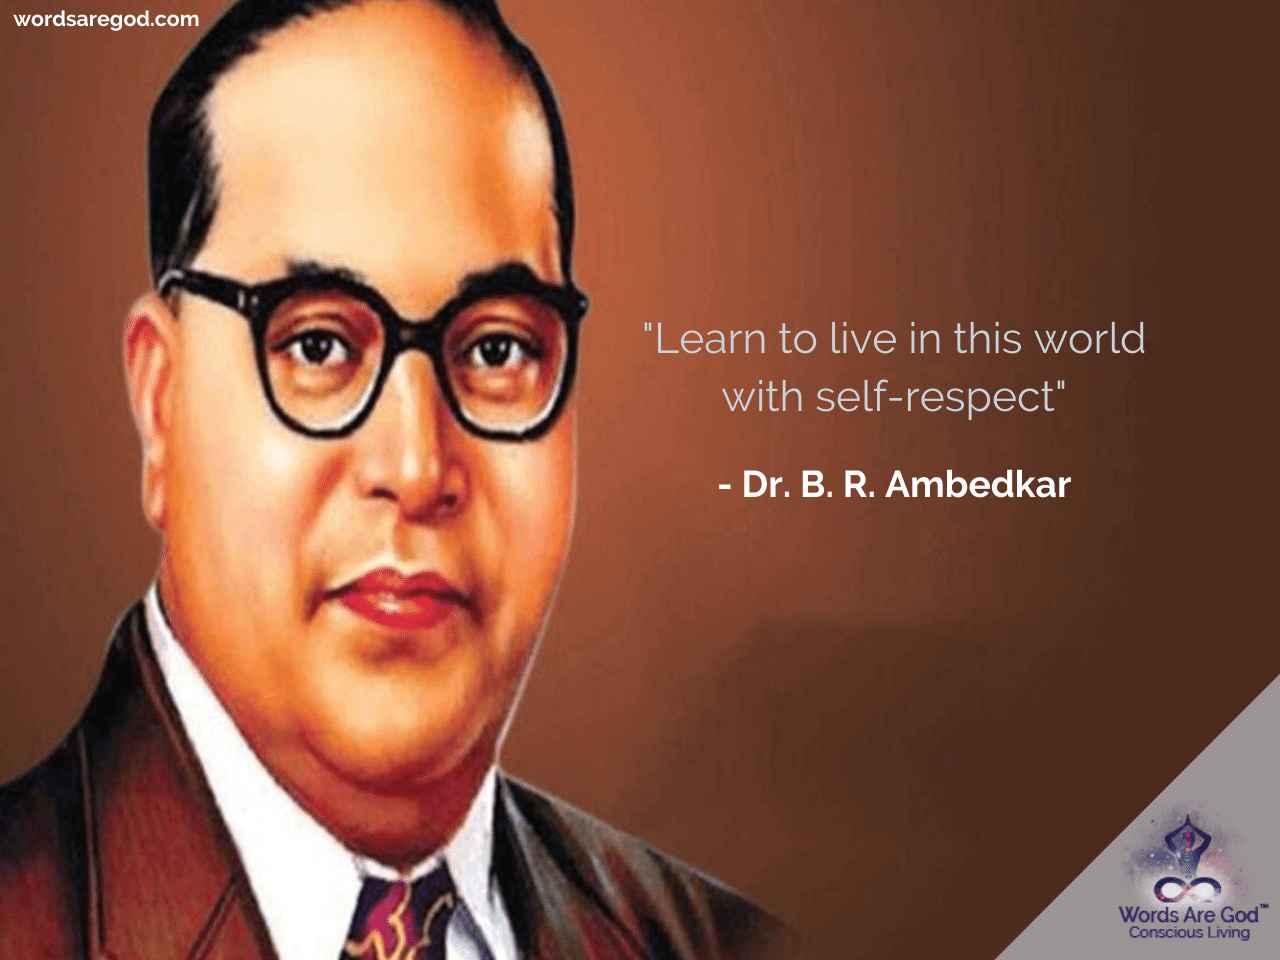 Dr. B. R. Ambedkar   Life Quote by Dr. B. R. Ambedkar